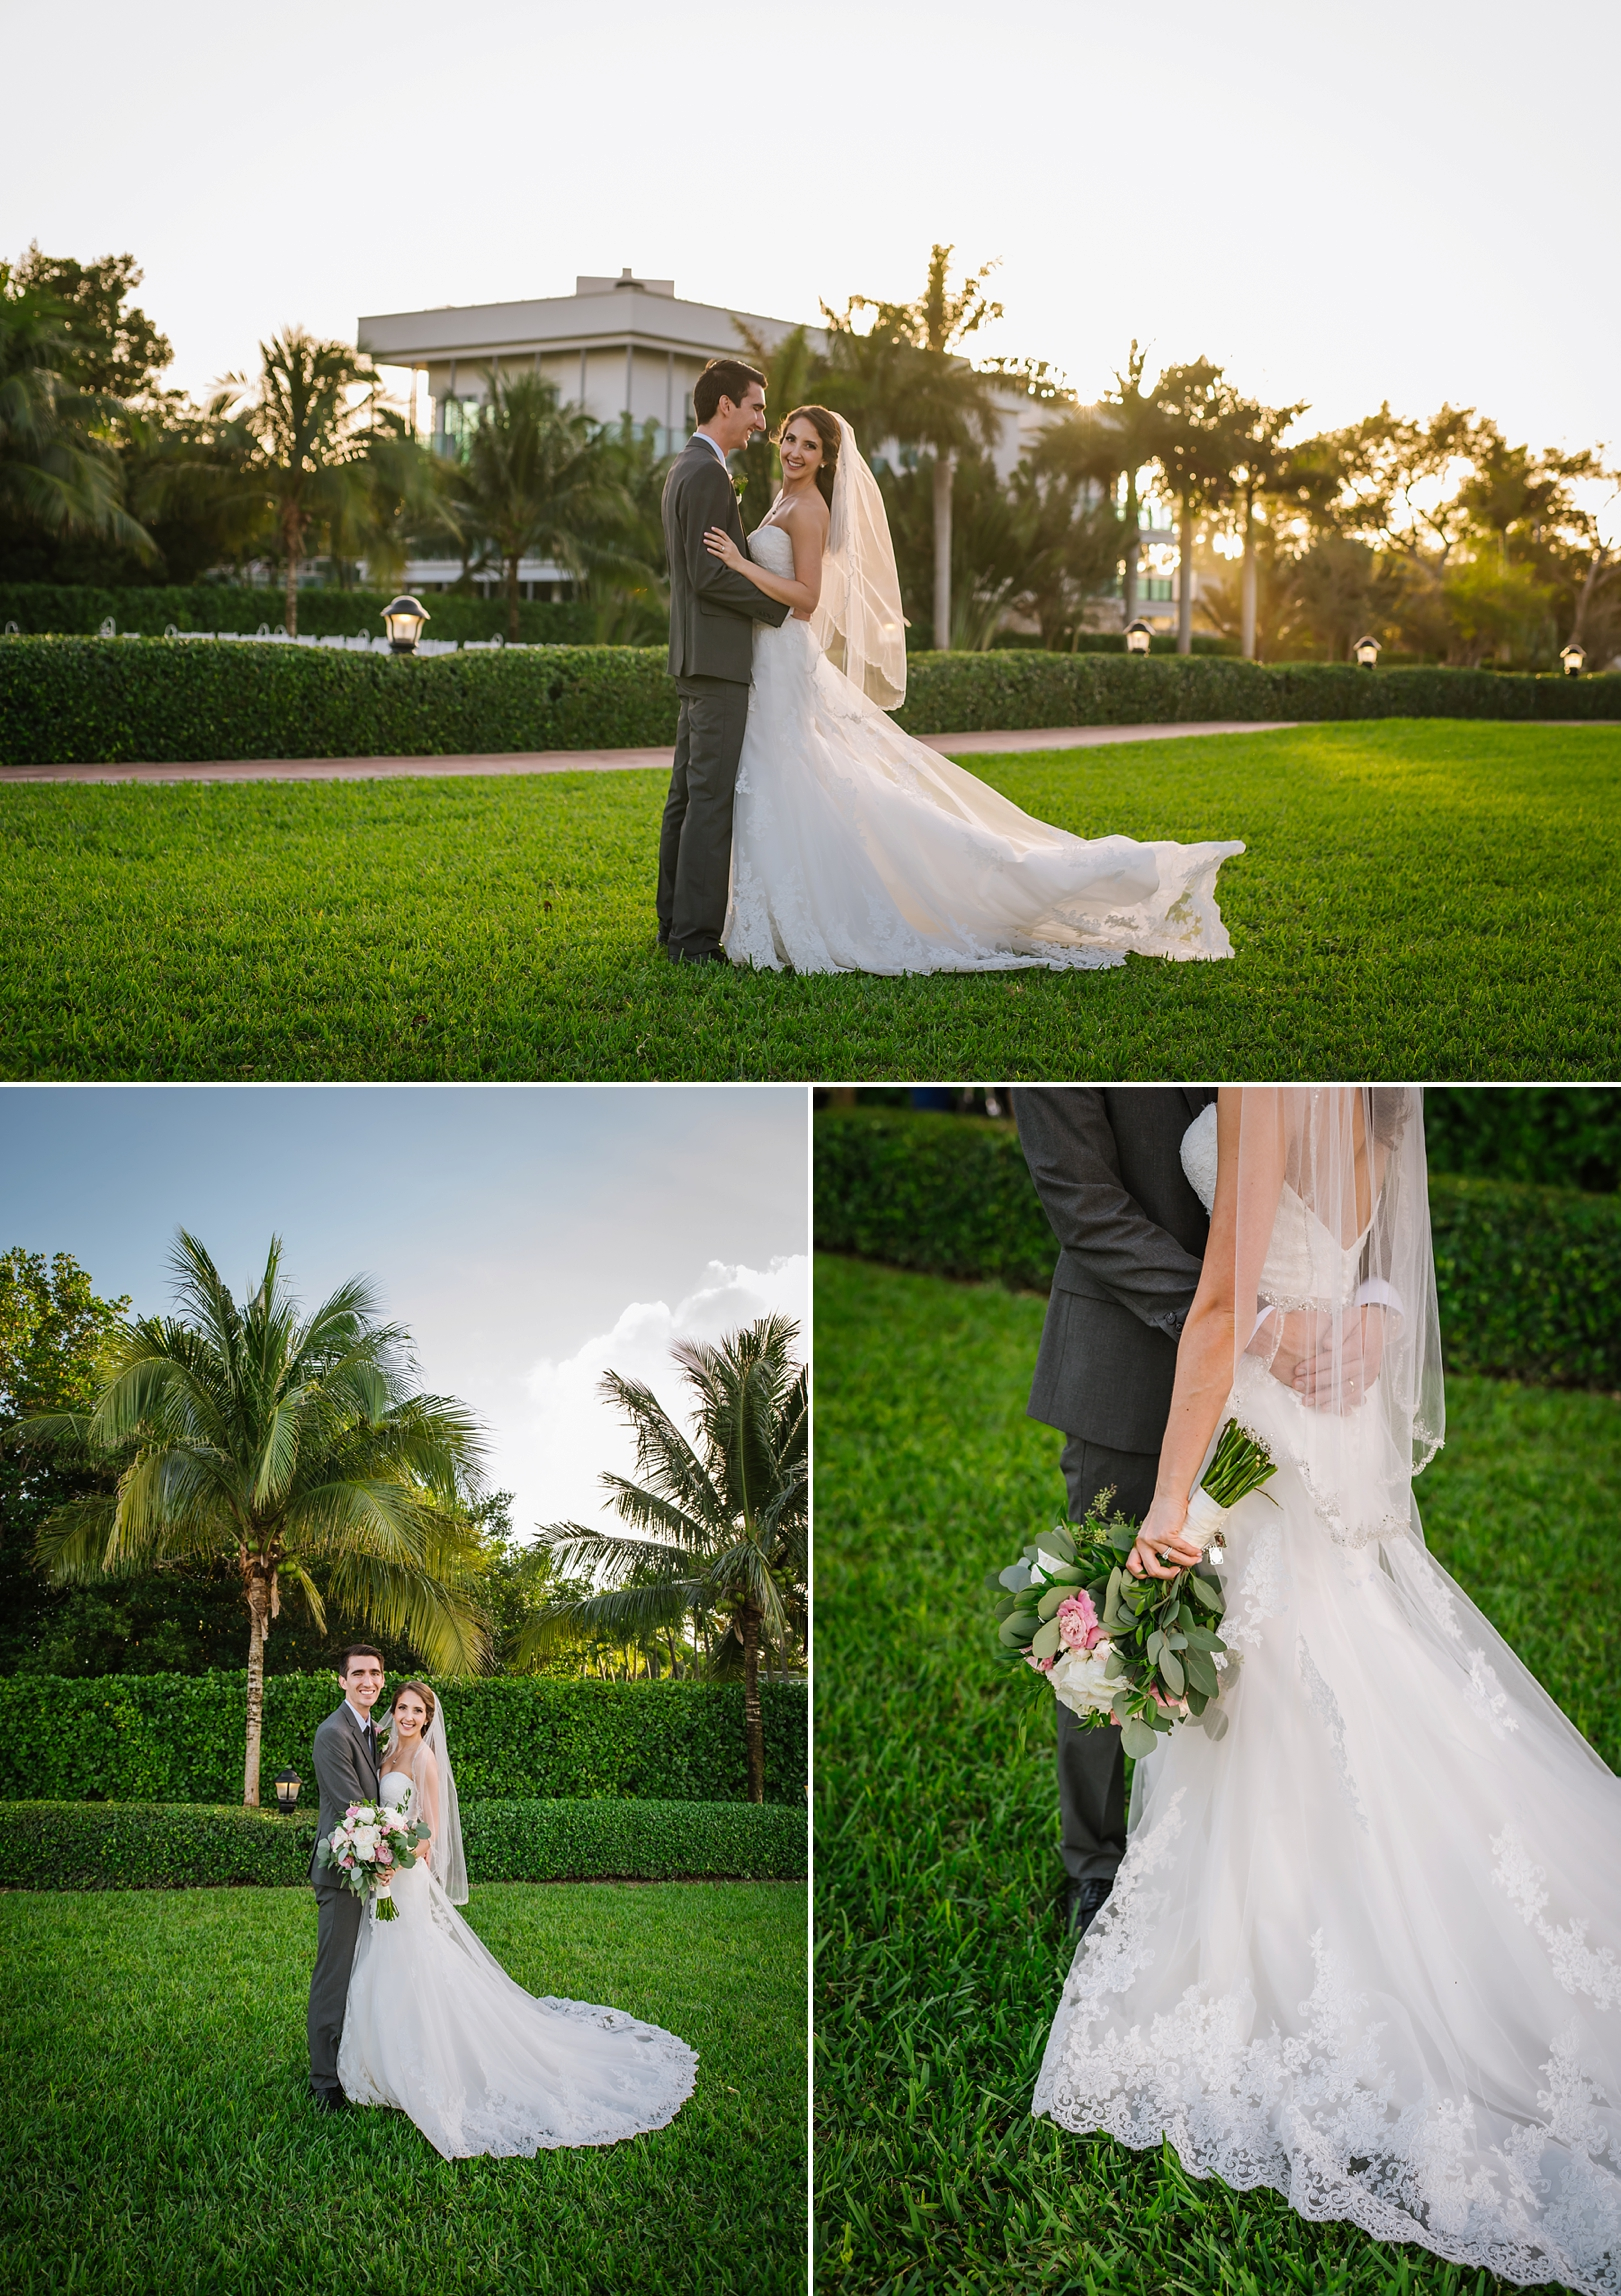 miami-wedding-photography-ashlee-hamon-elegant-vintage-antique-wedding_0020.jpg